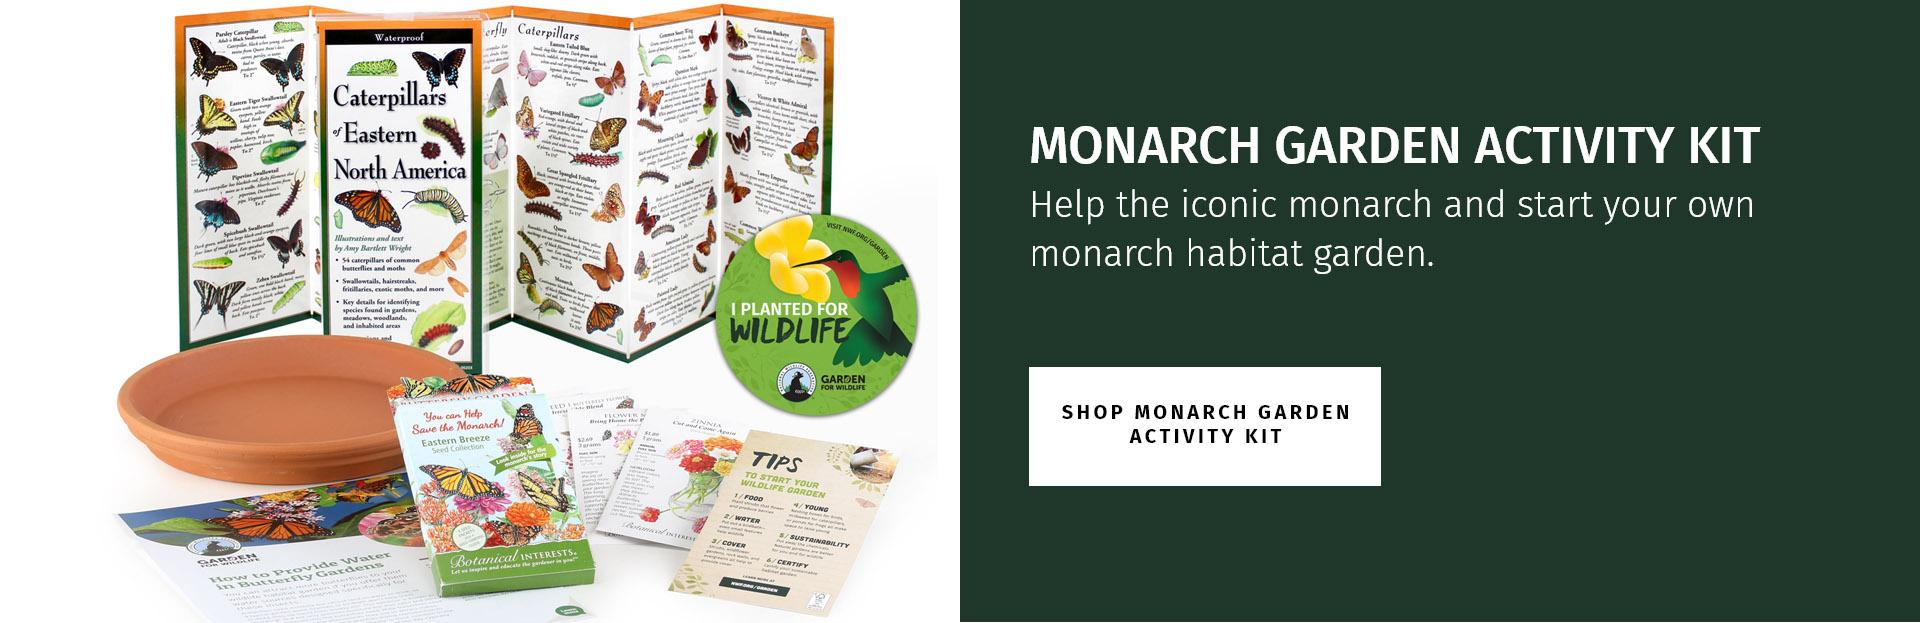 Monarch garden activity kit. help the iconic monarch and start your own monarch habitat garden.